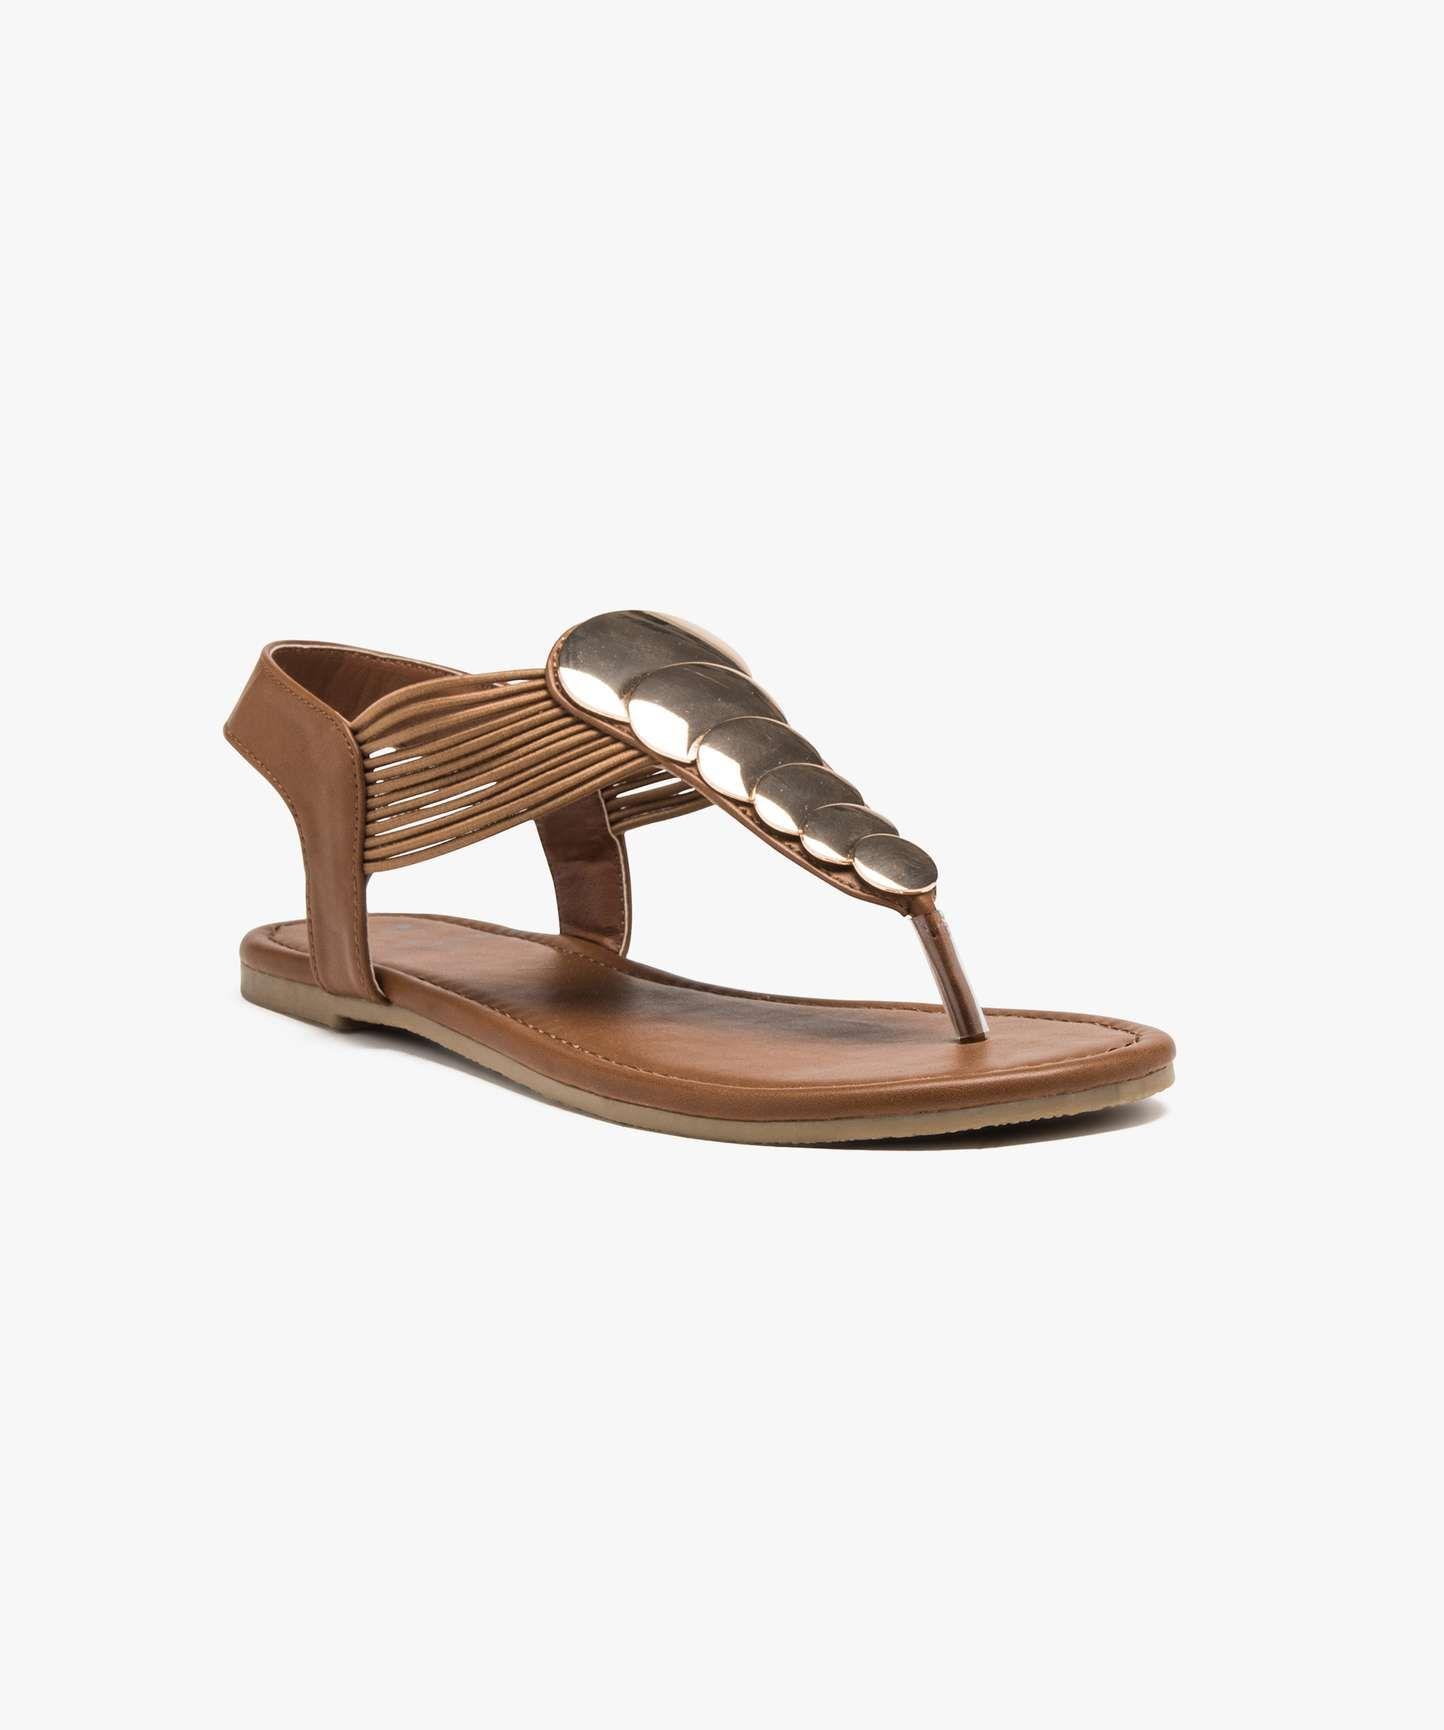 Sandales plates dessus bijoux Camel